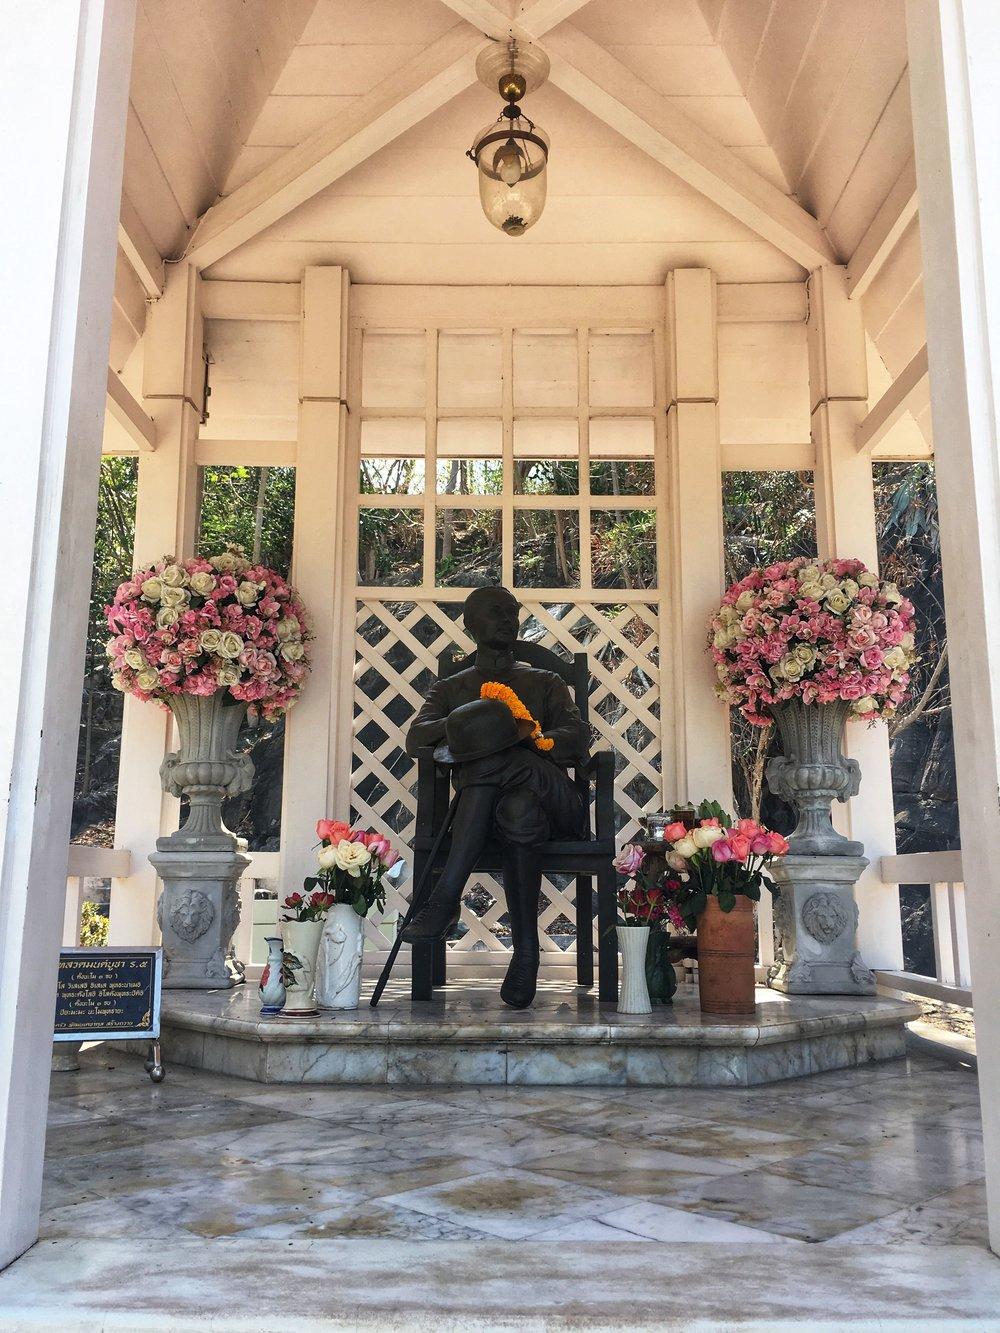 a memorial to King Chulalongkorn on Koh Sichang Island